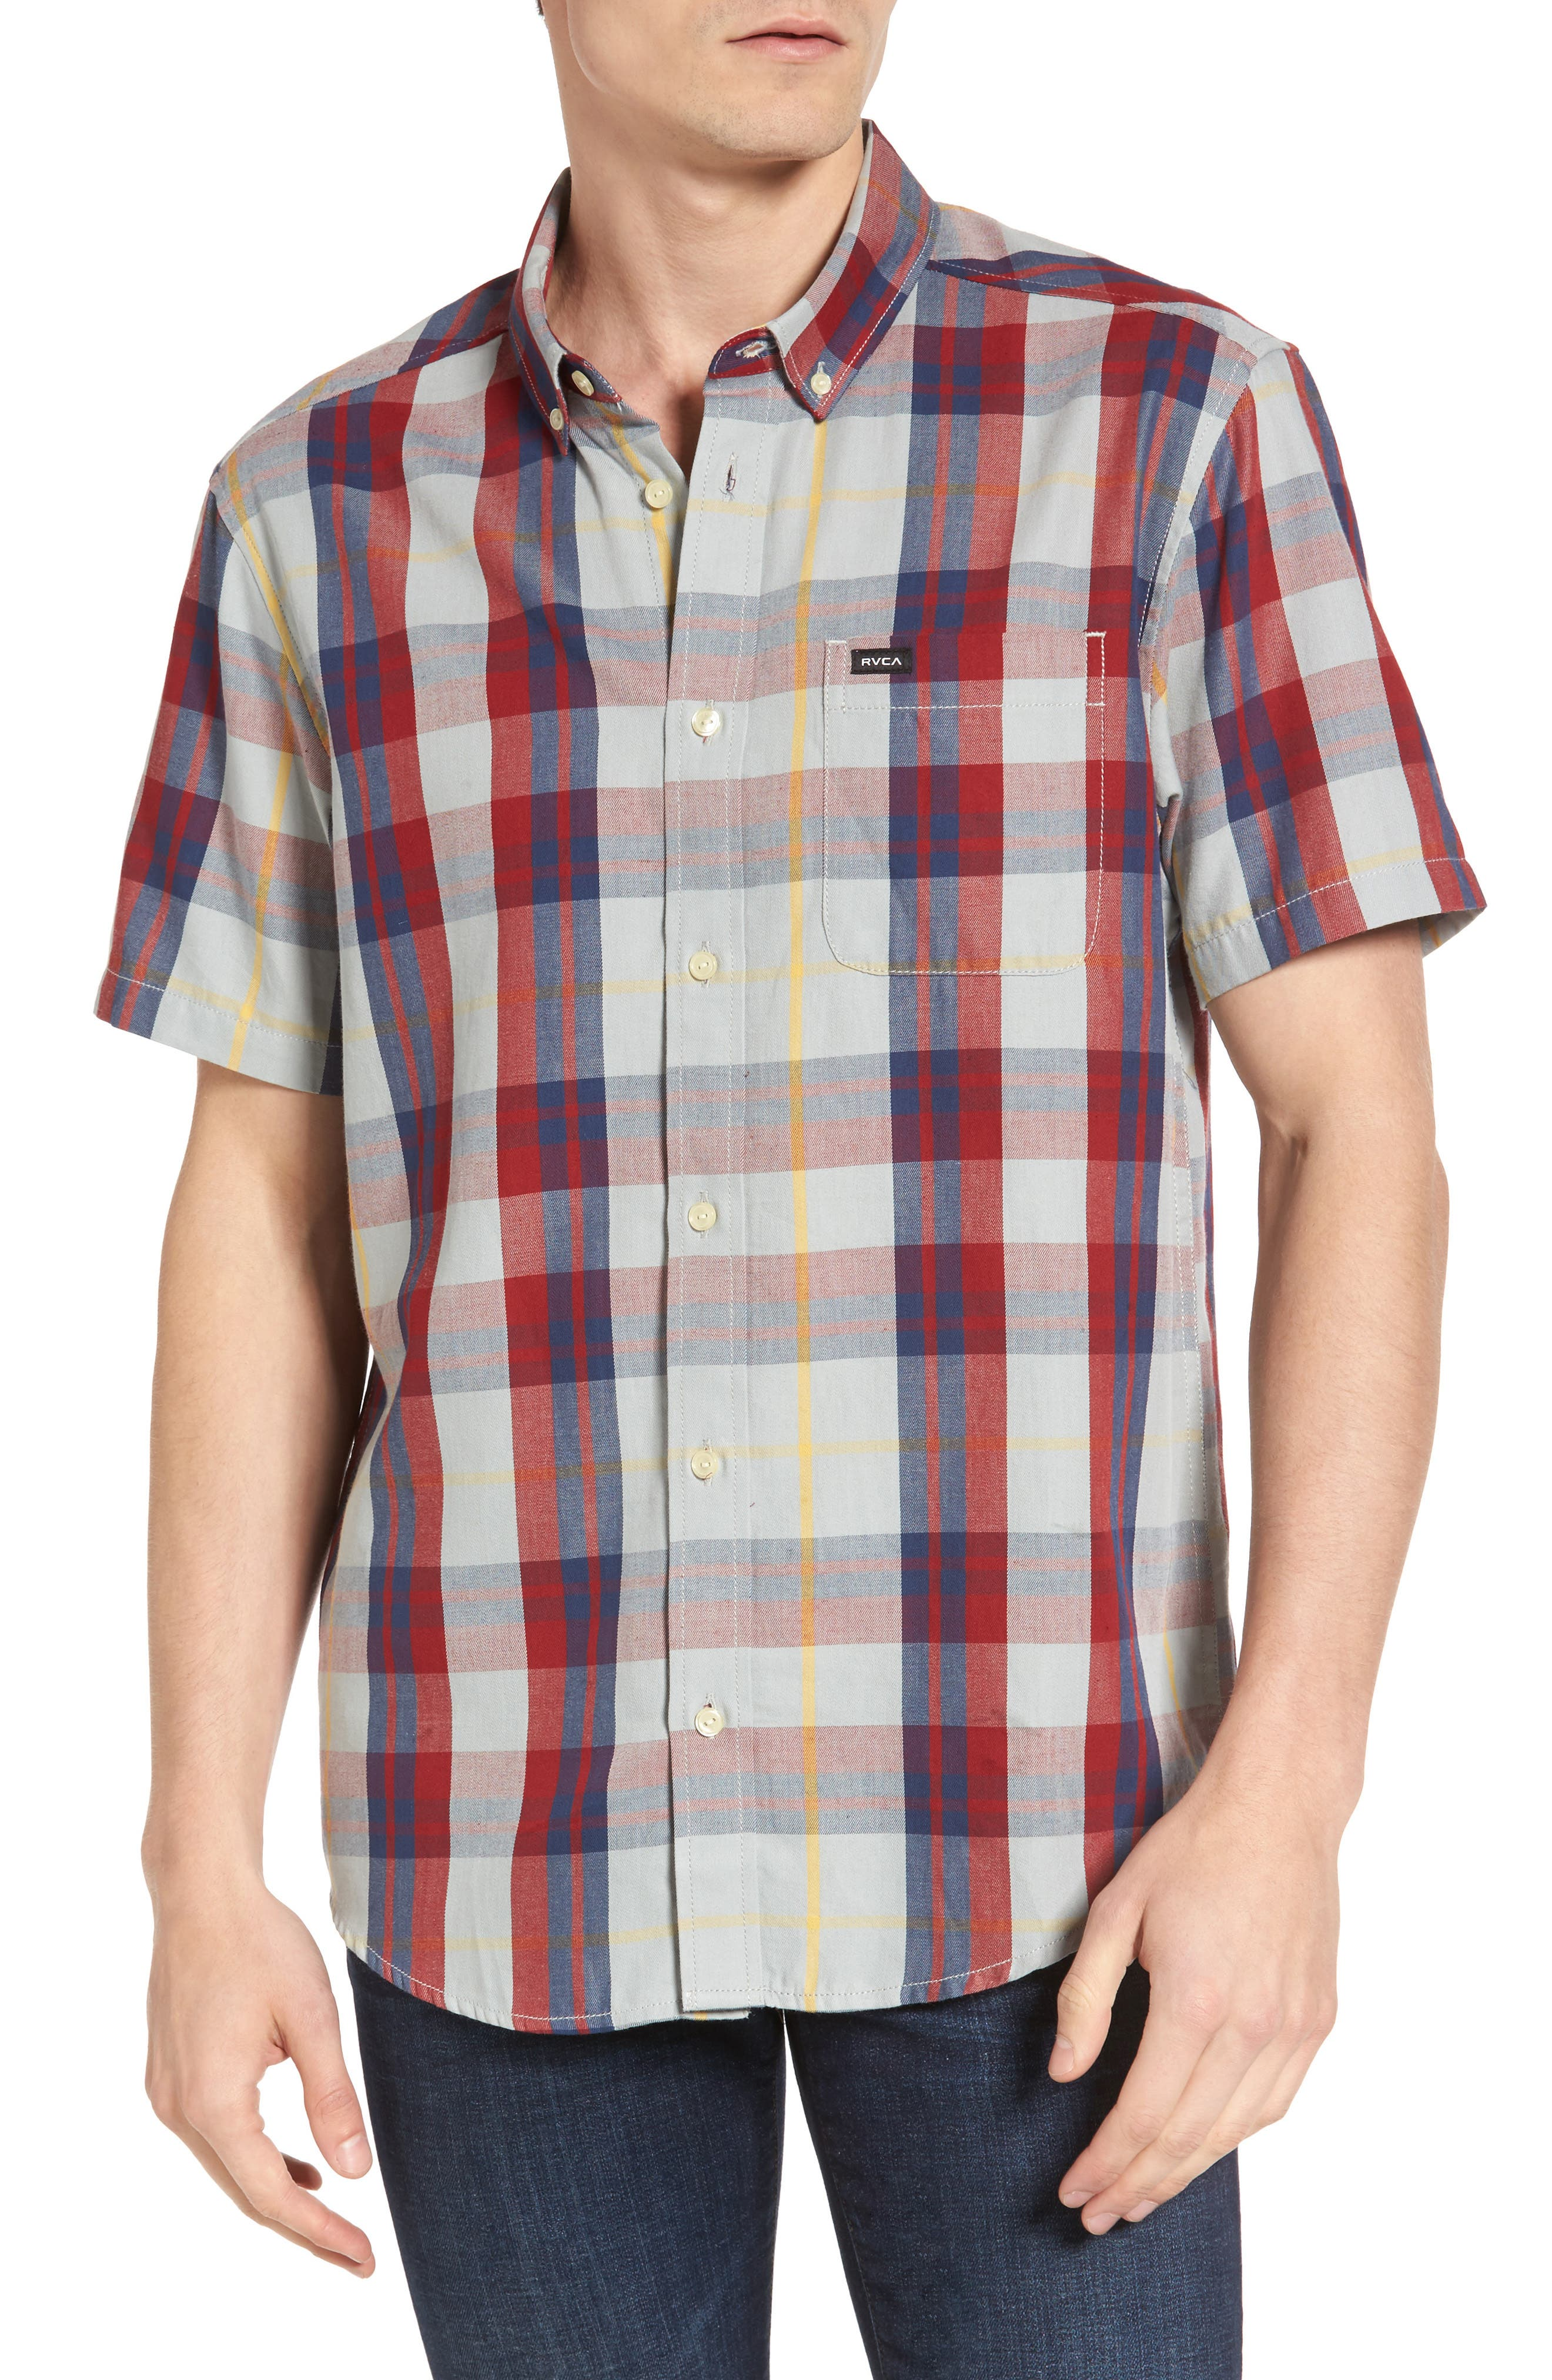 Main Image - RVCA Waas 2 Plaid Woven Shirt